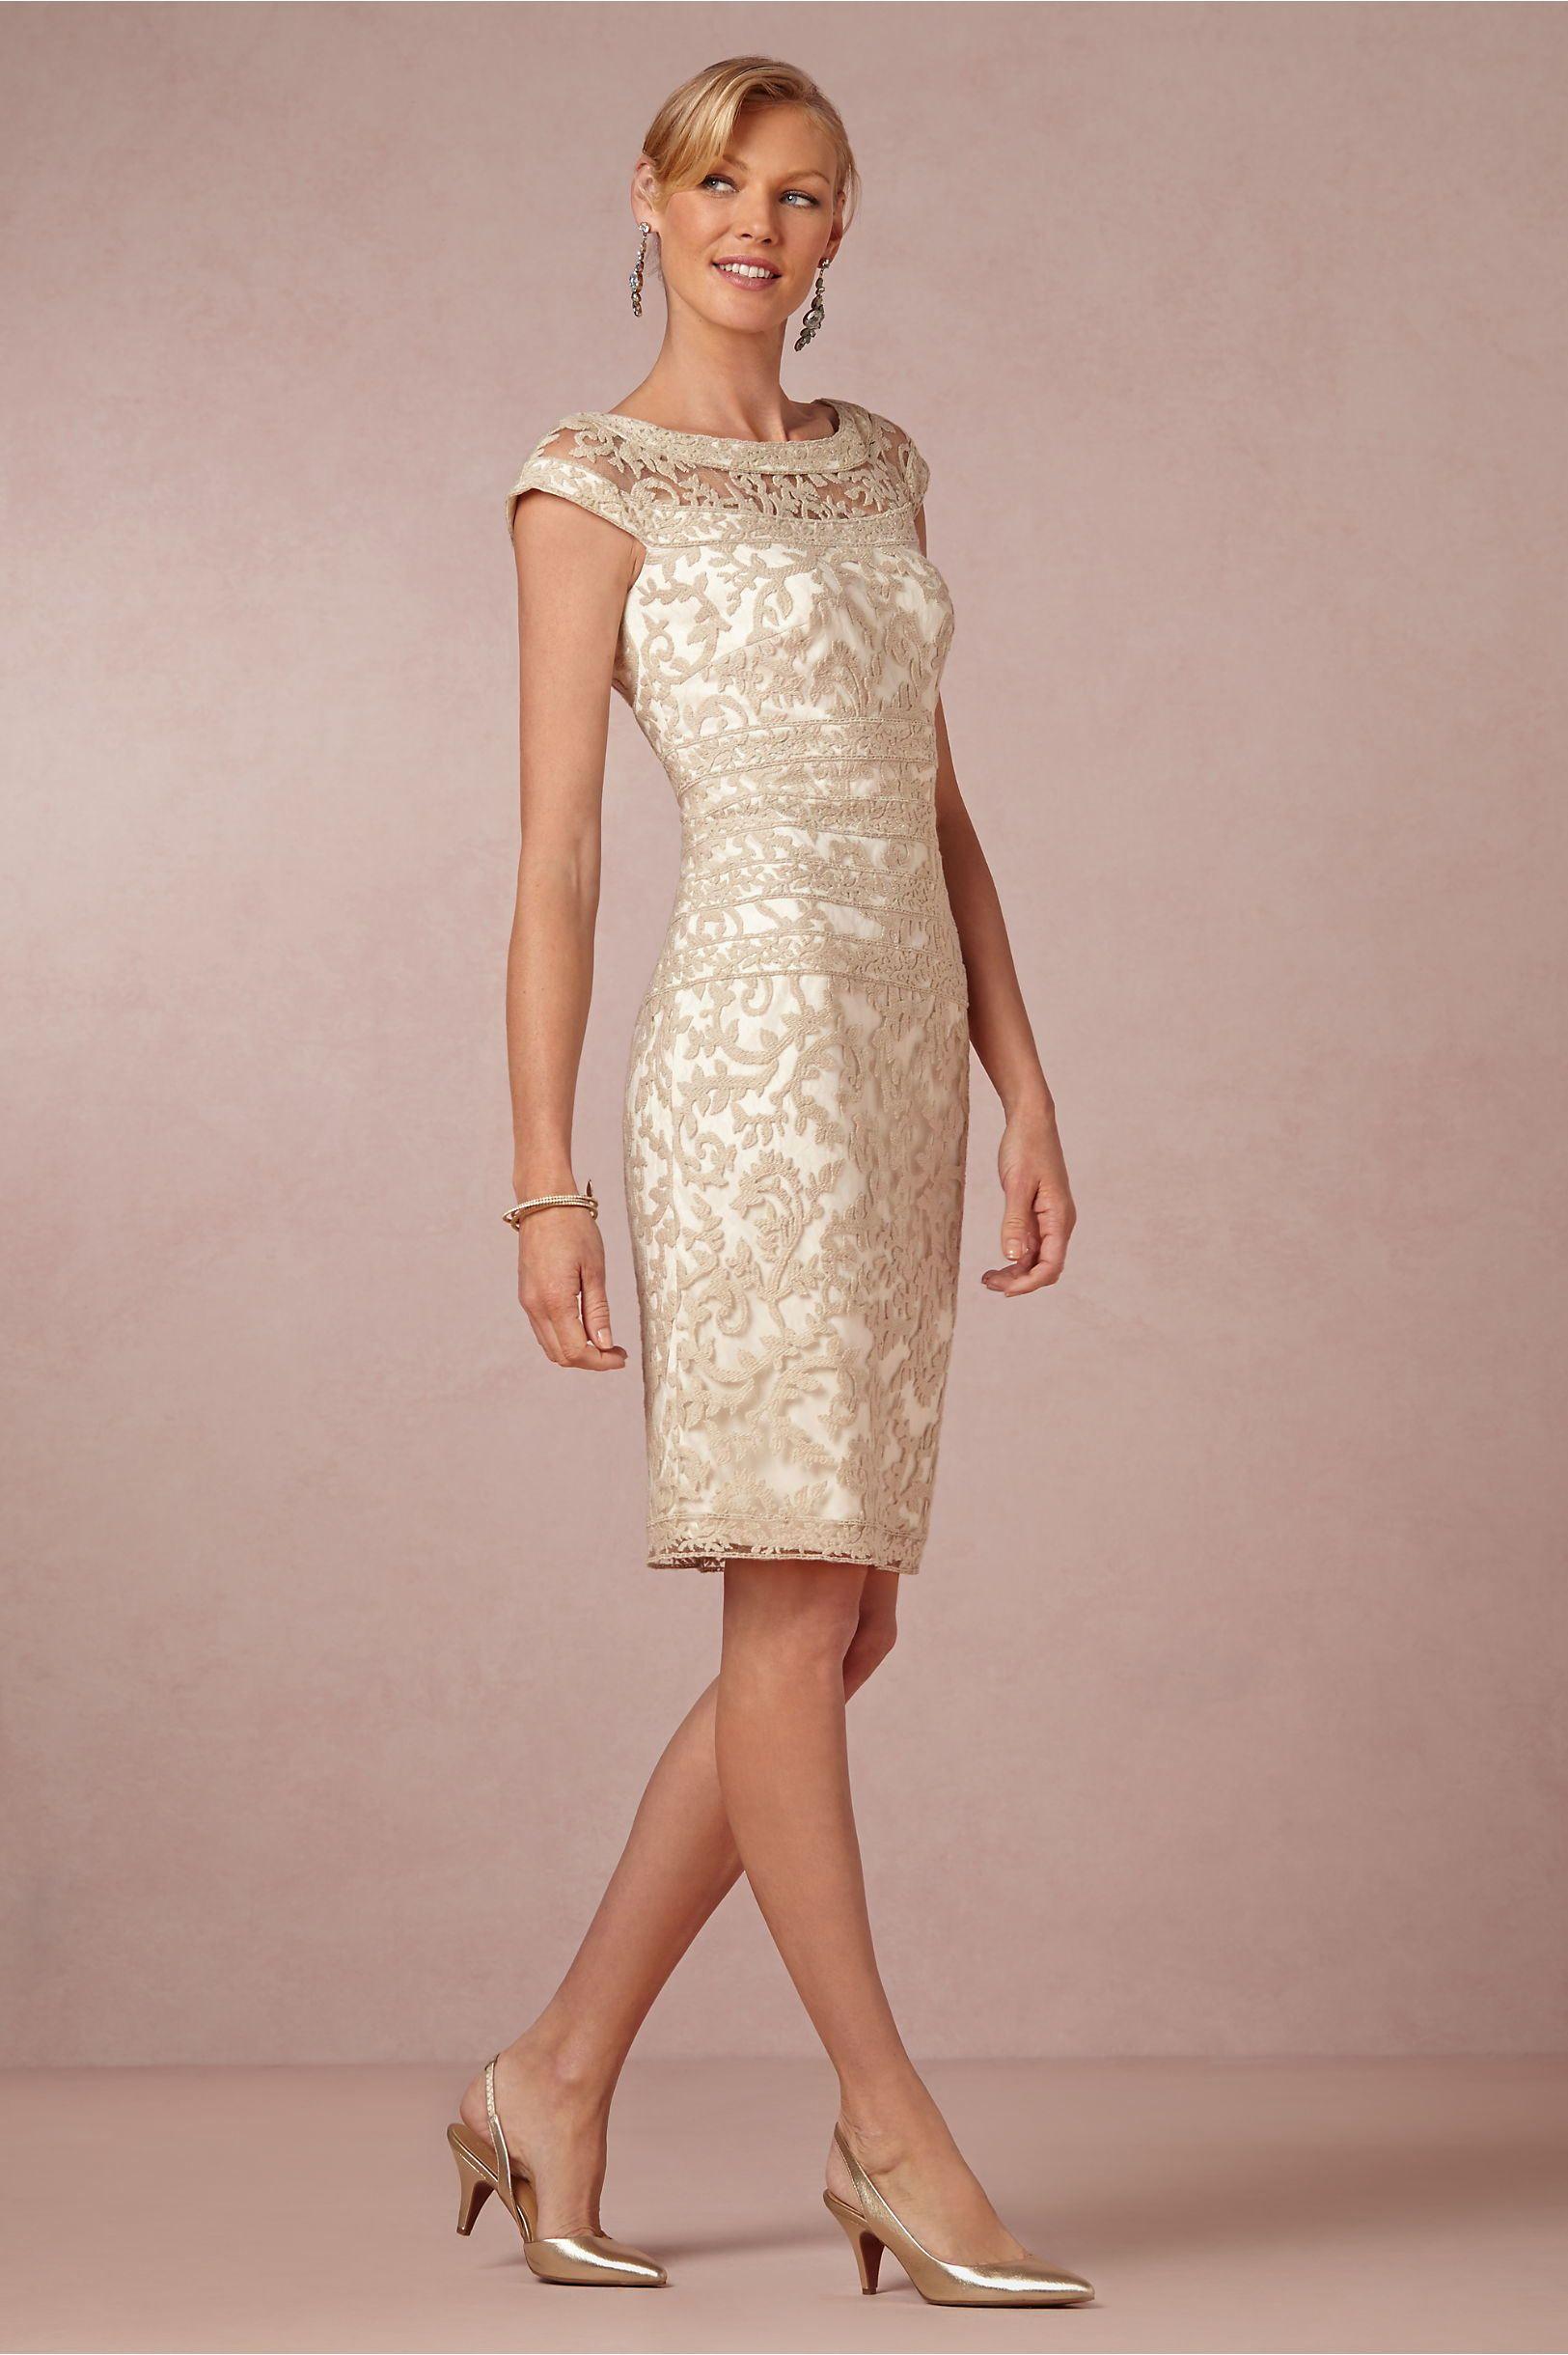 Fancy Vestidos De Madre Novia Ensign - Wedding Dress Ideas ...